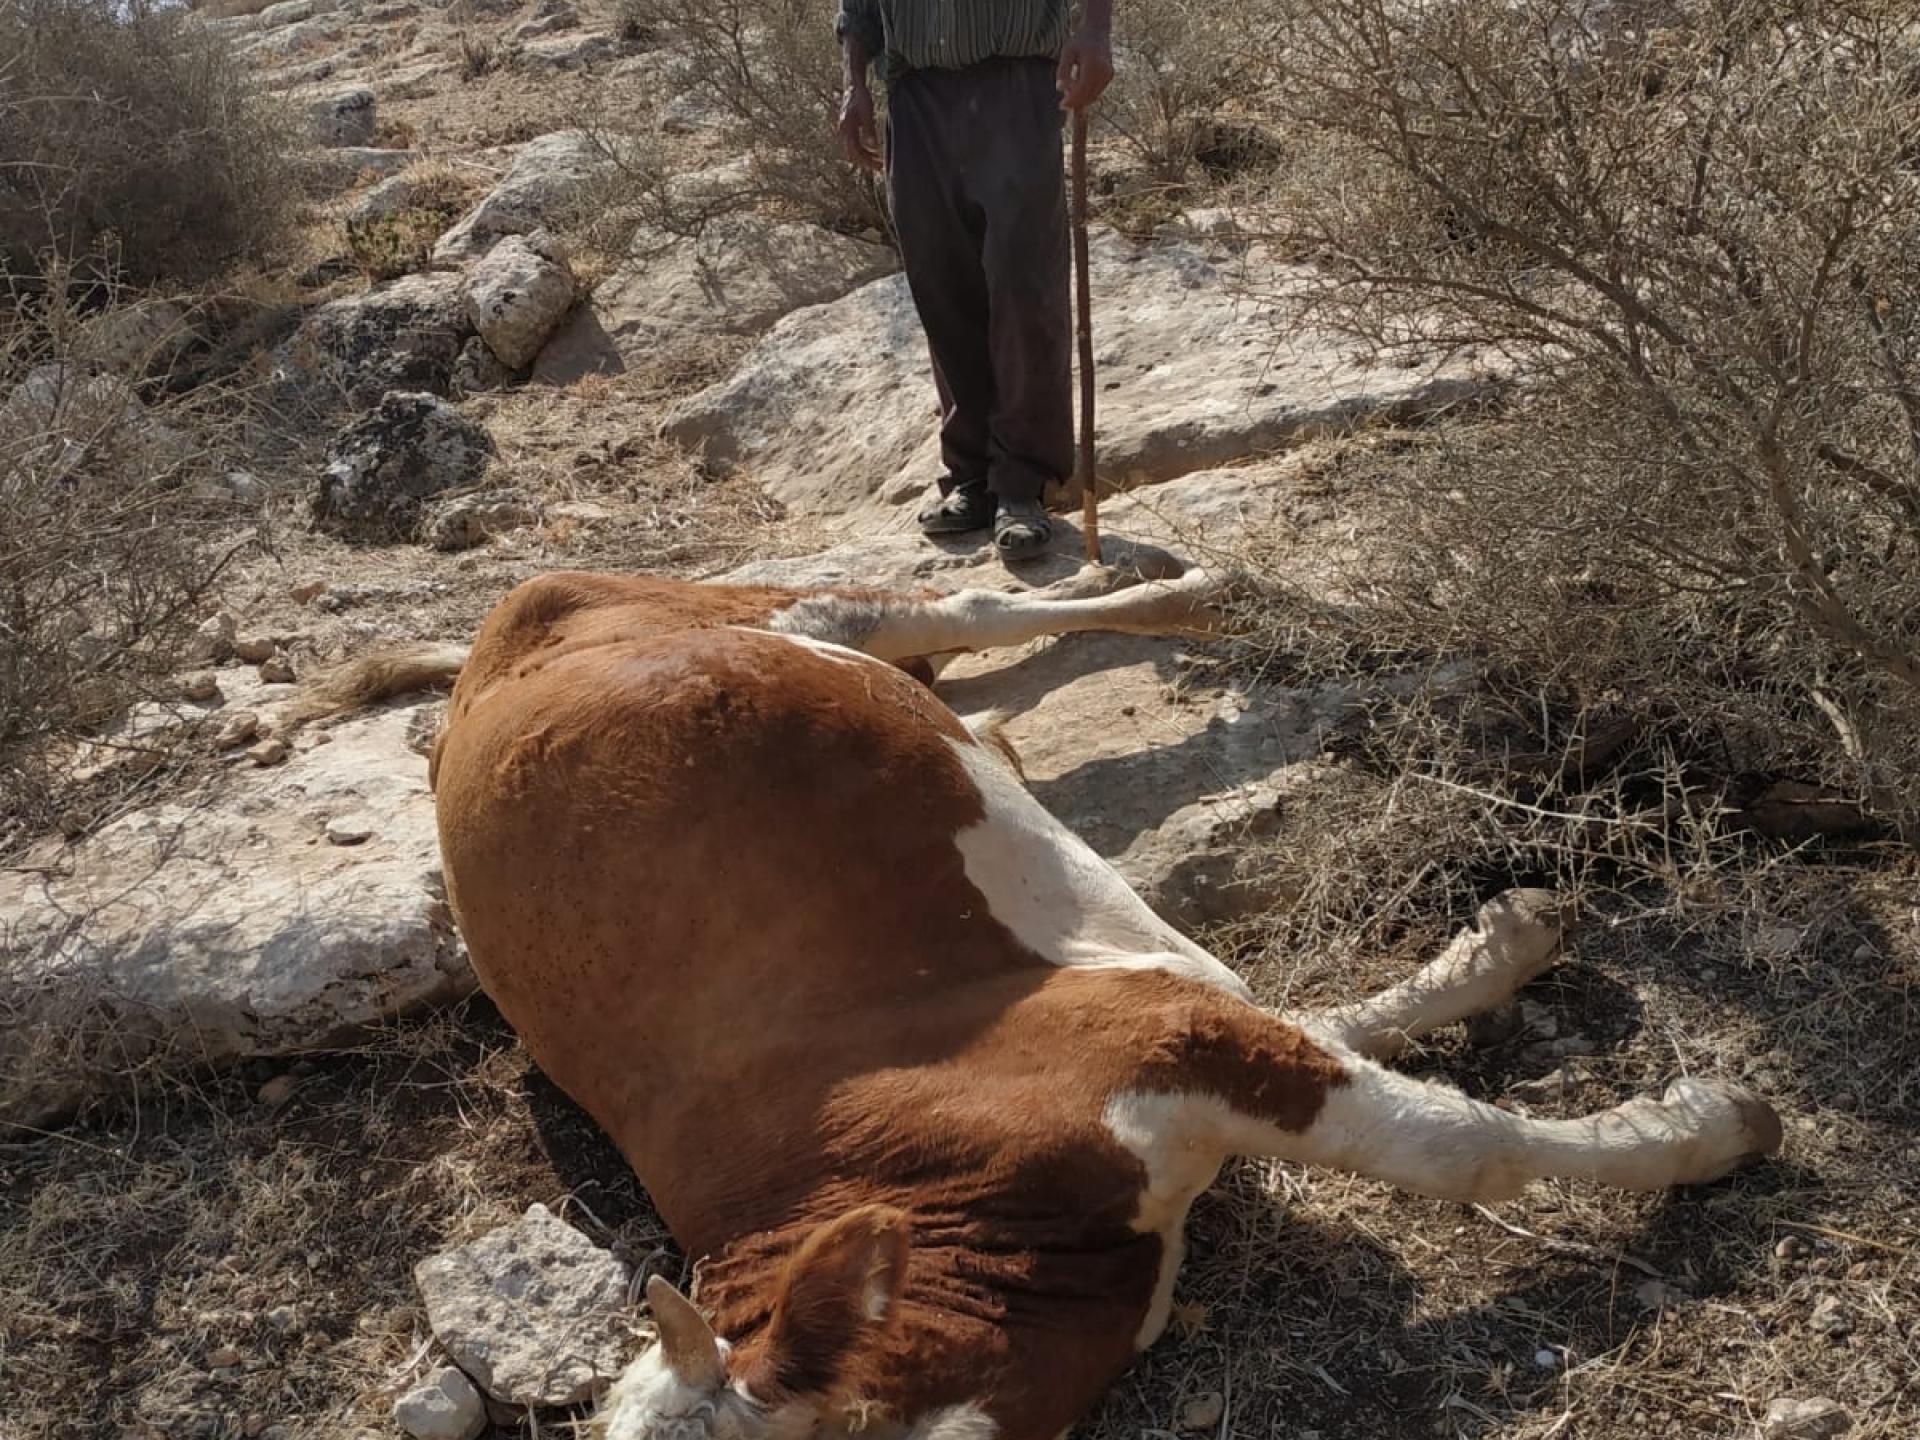 el Hadidiya: one of the cows that were killed by the army